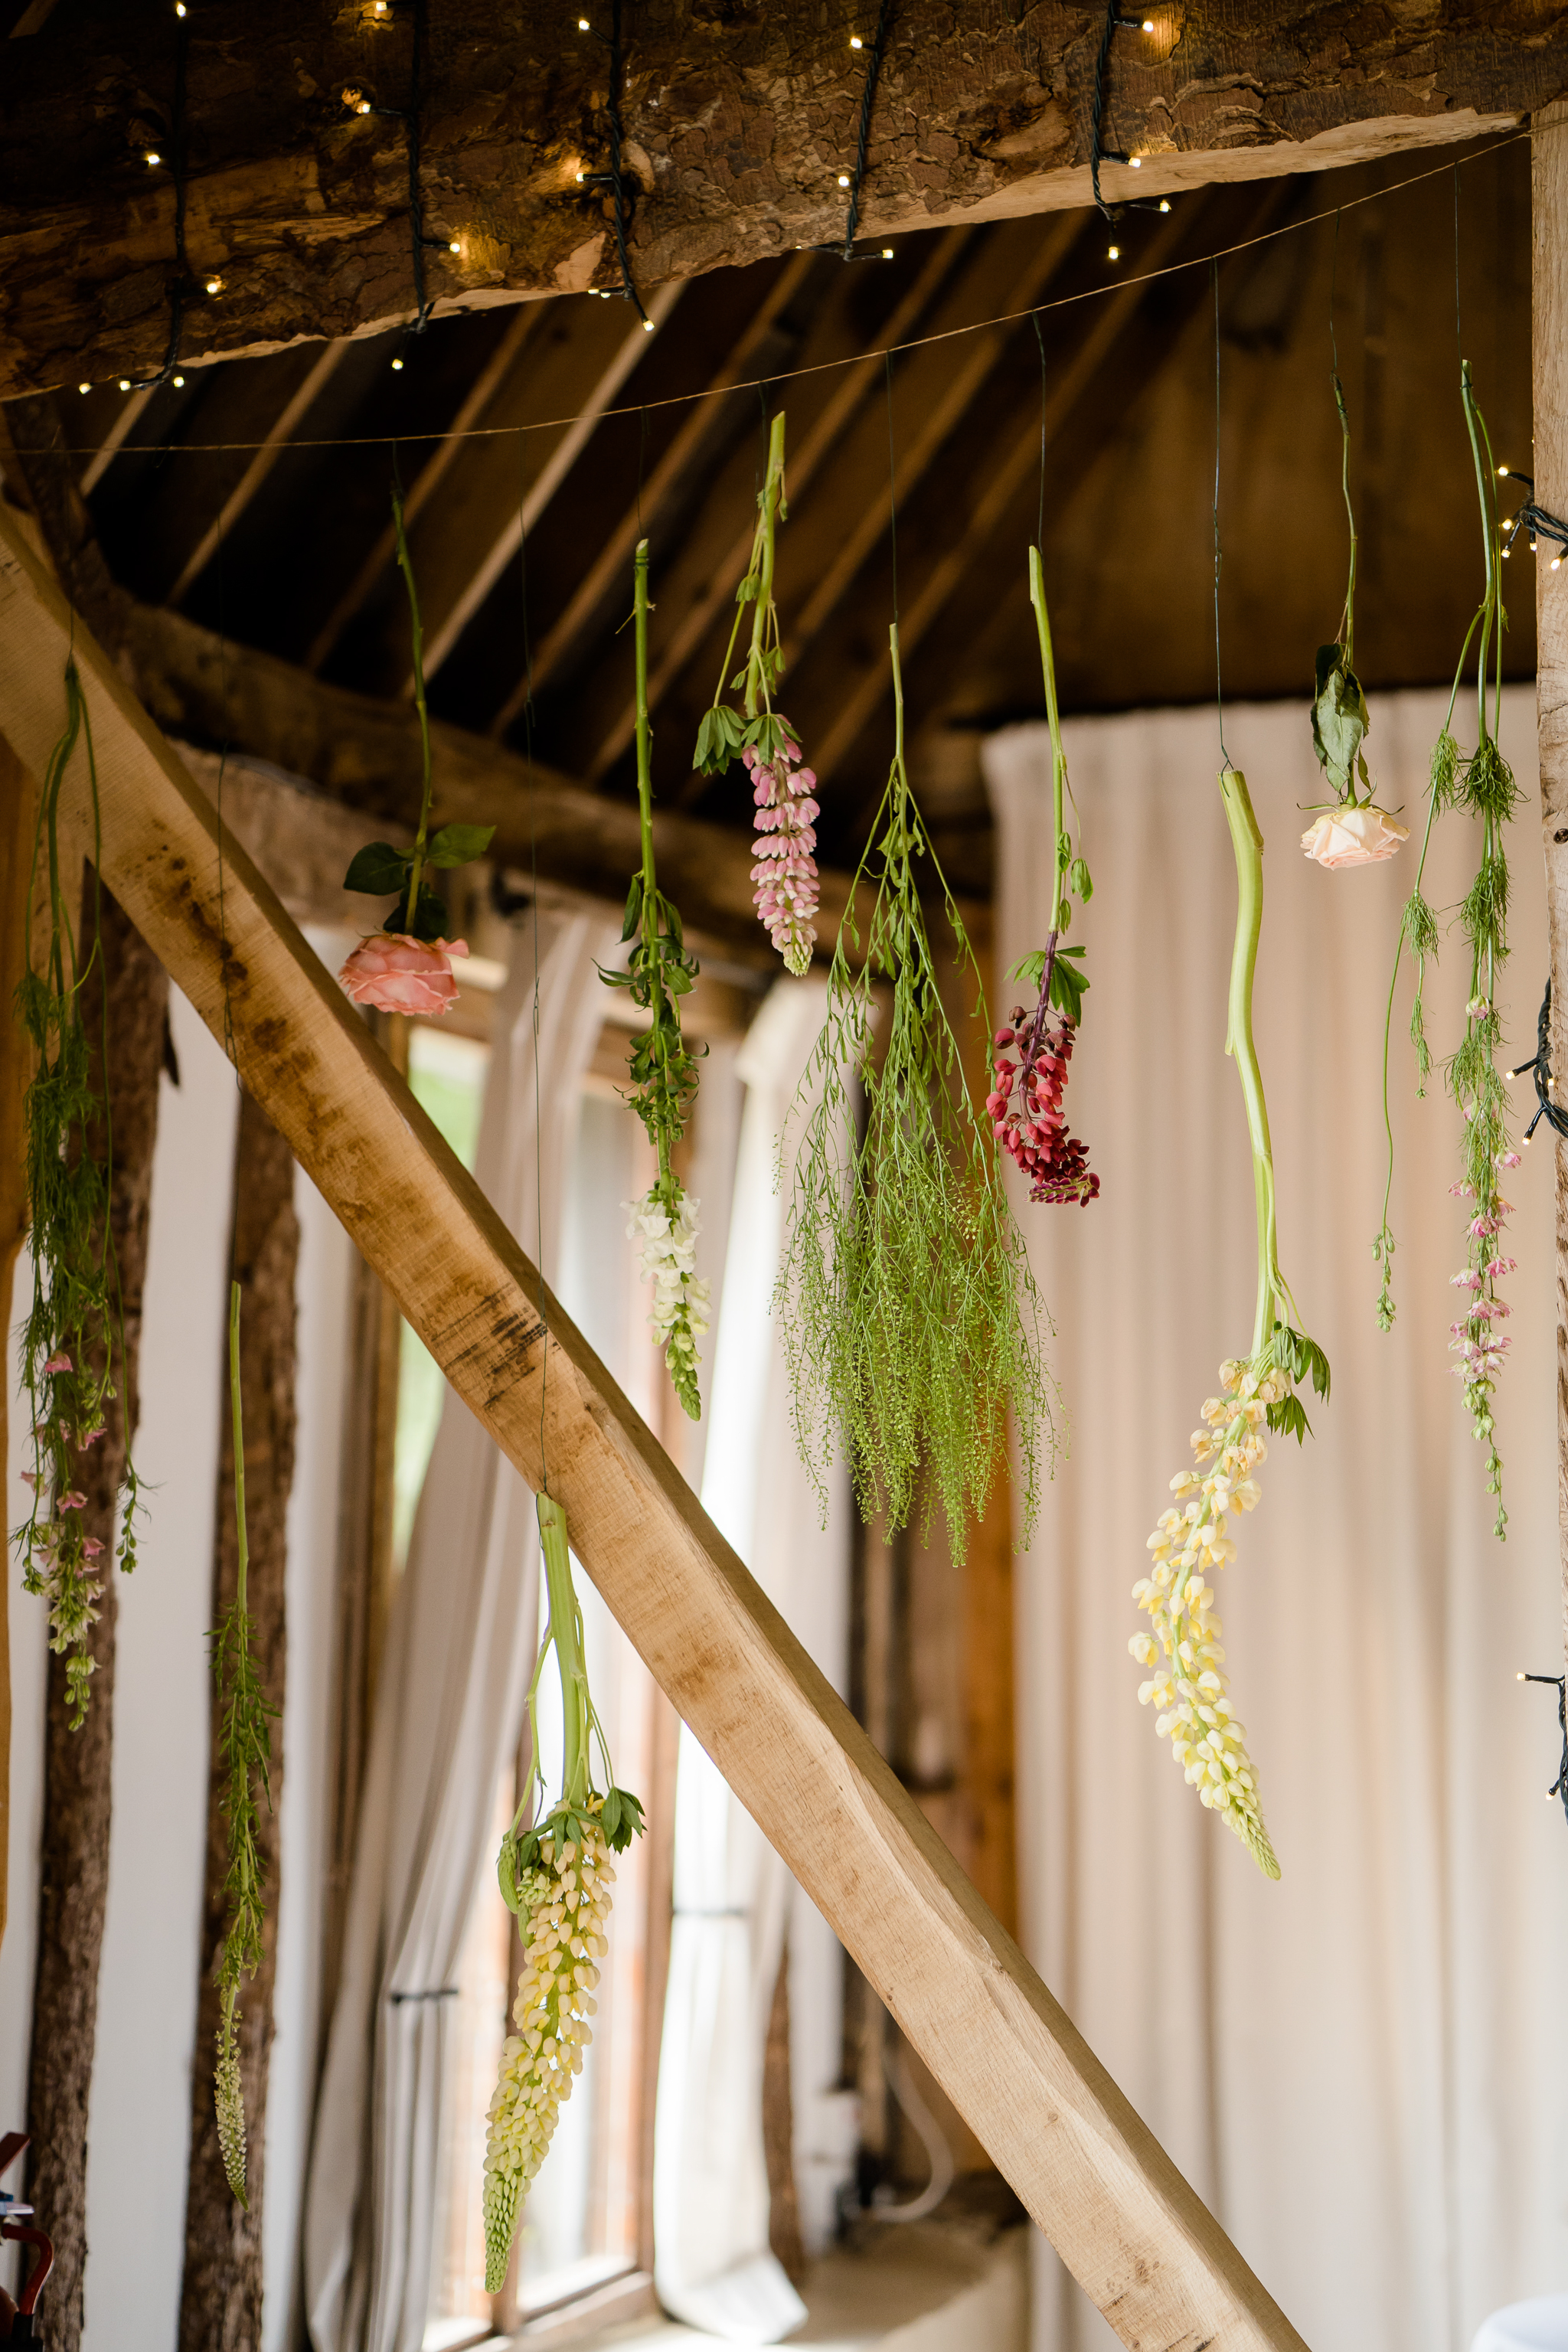 Hanging flower wedding decor by The White Horse Flower Company Newbury